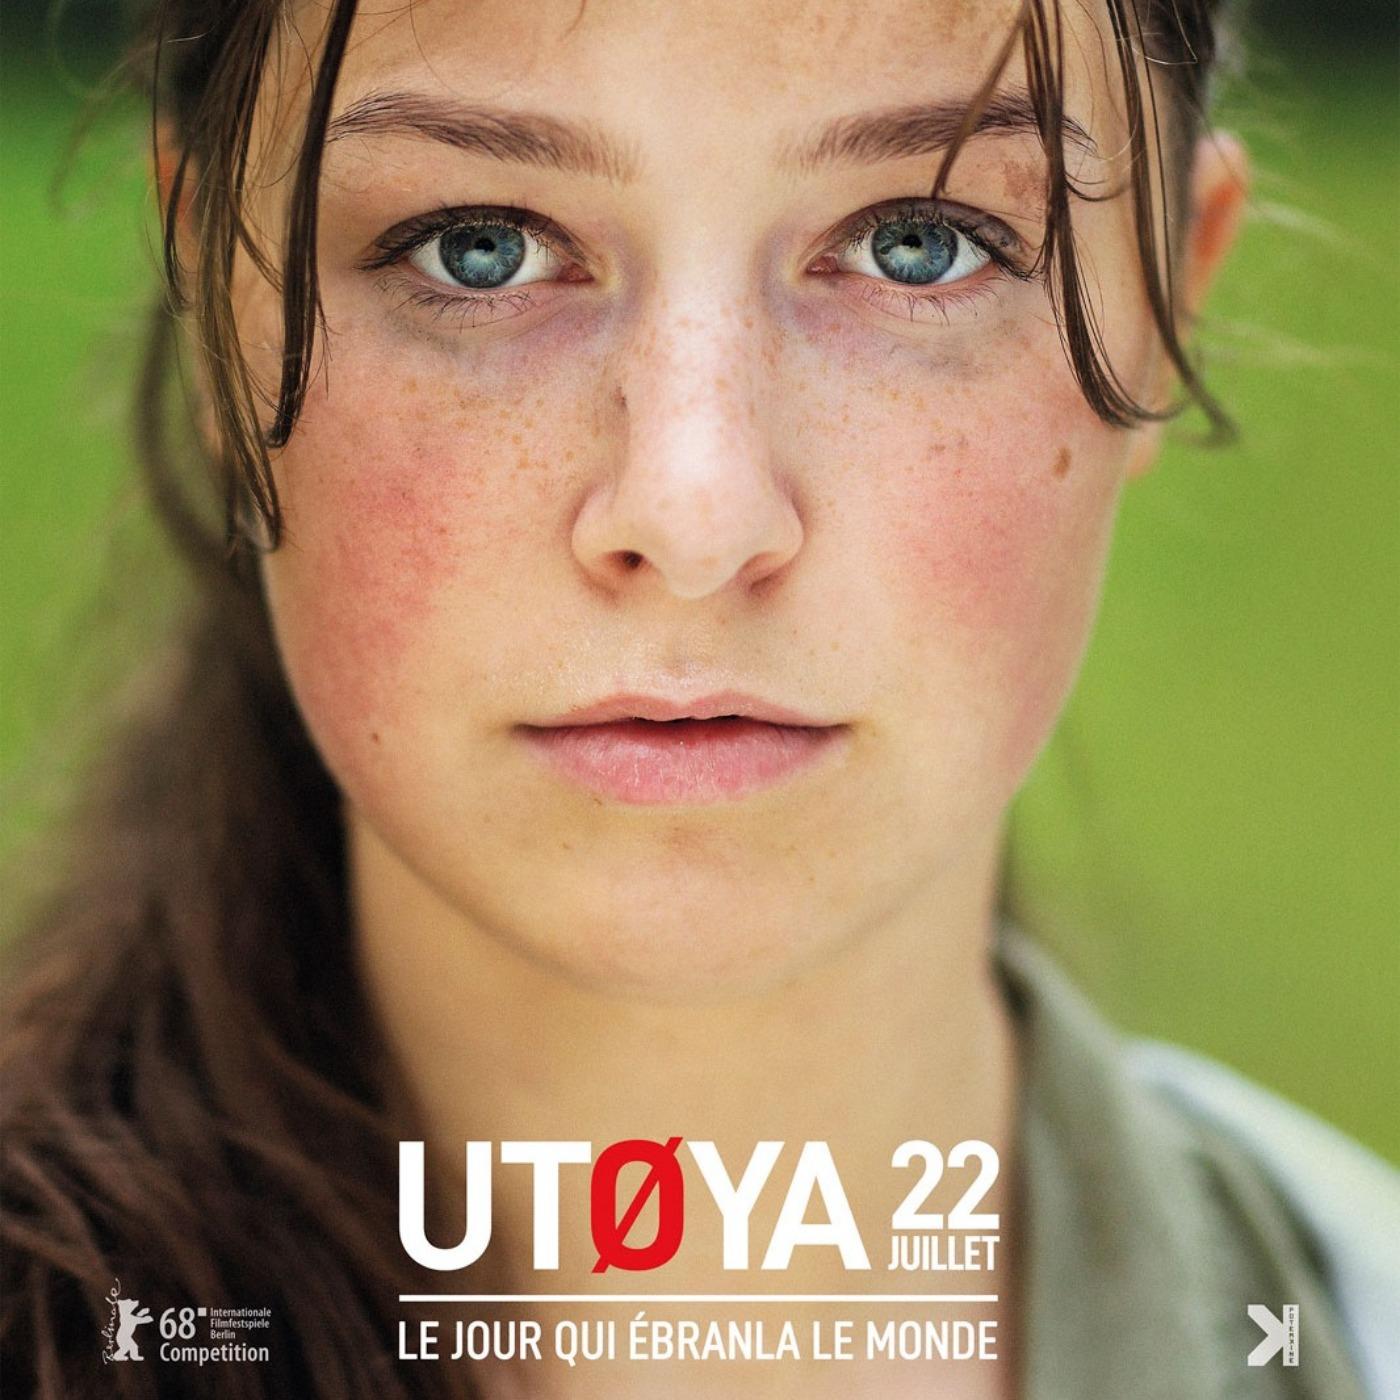 Ciné Parler #26 | Critique du Film UTOYA, 22 JUILLET